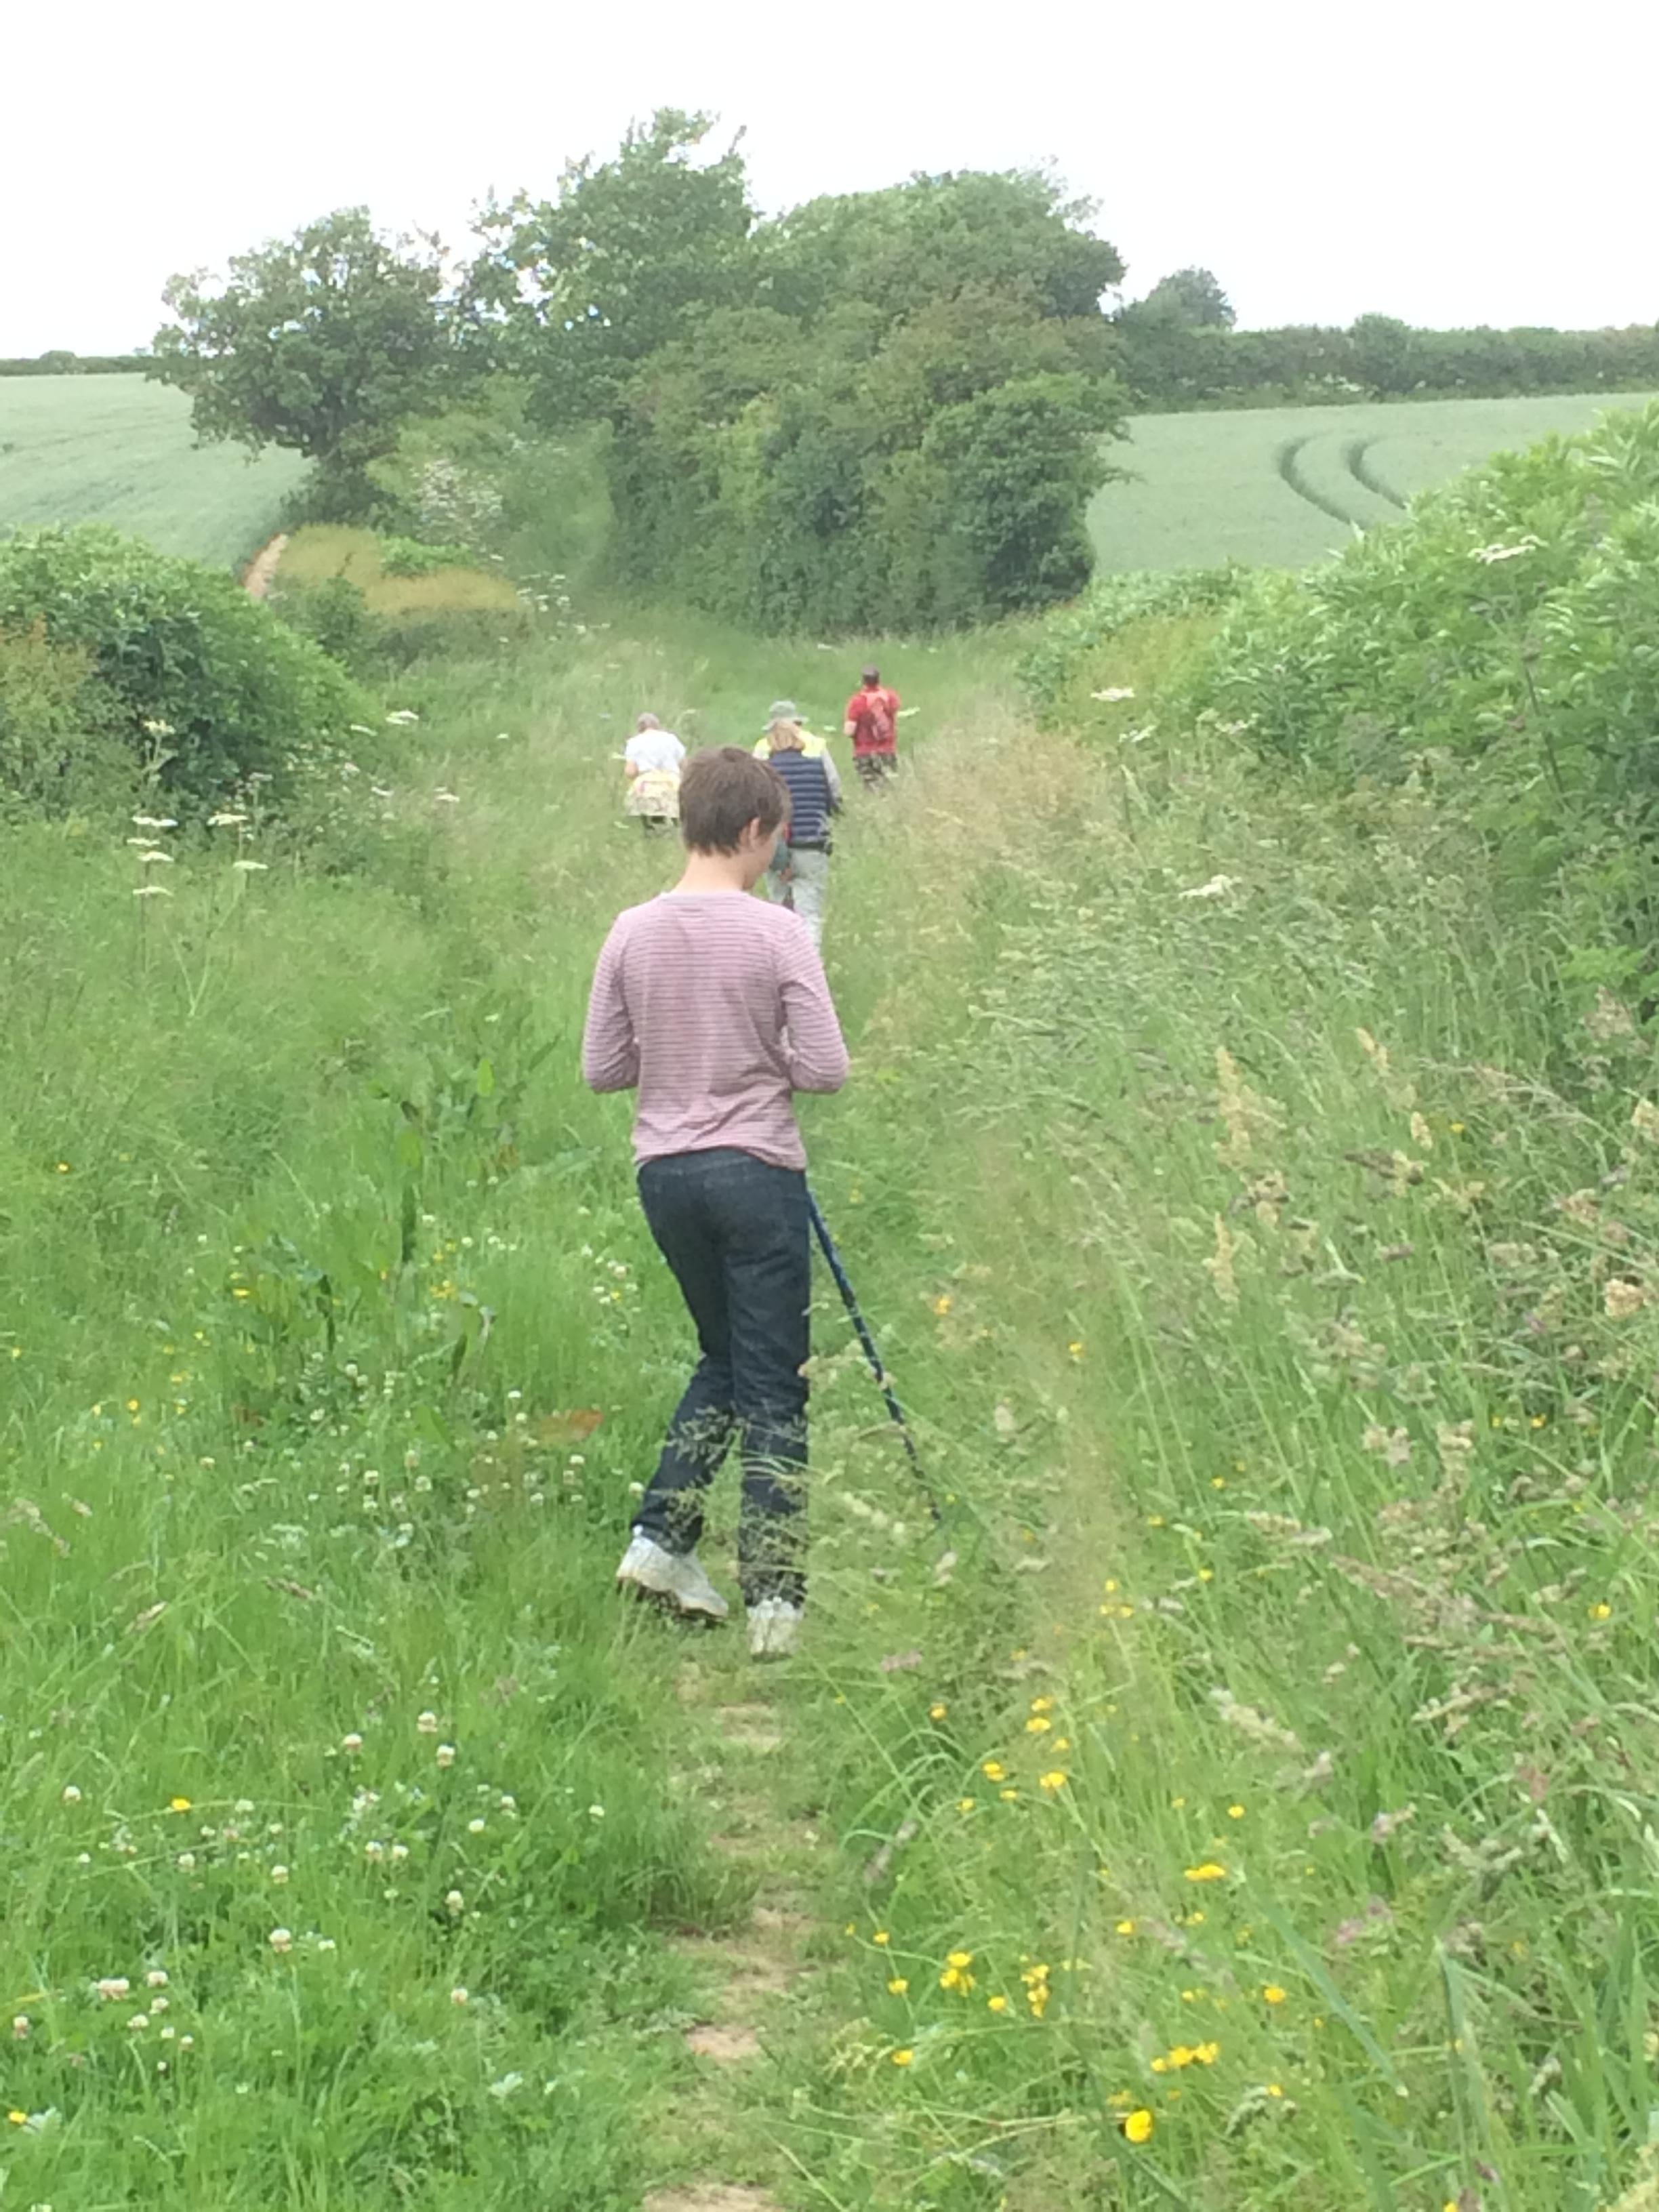 A nice grassy track